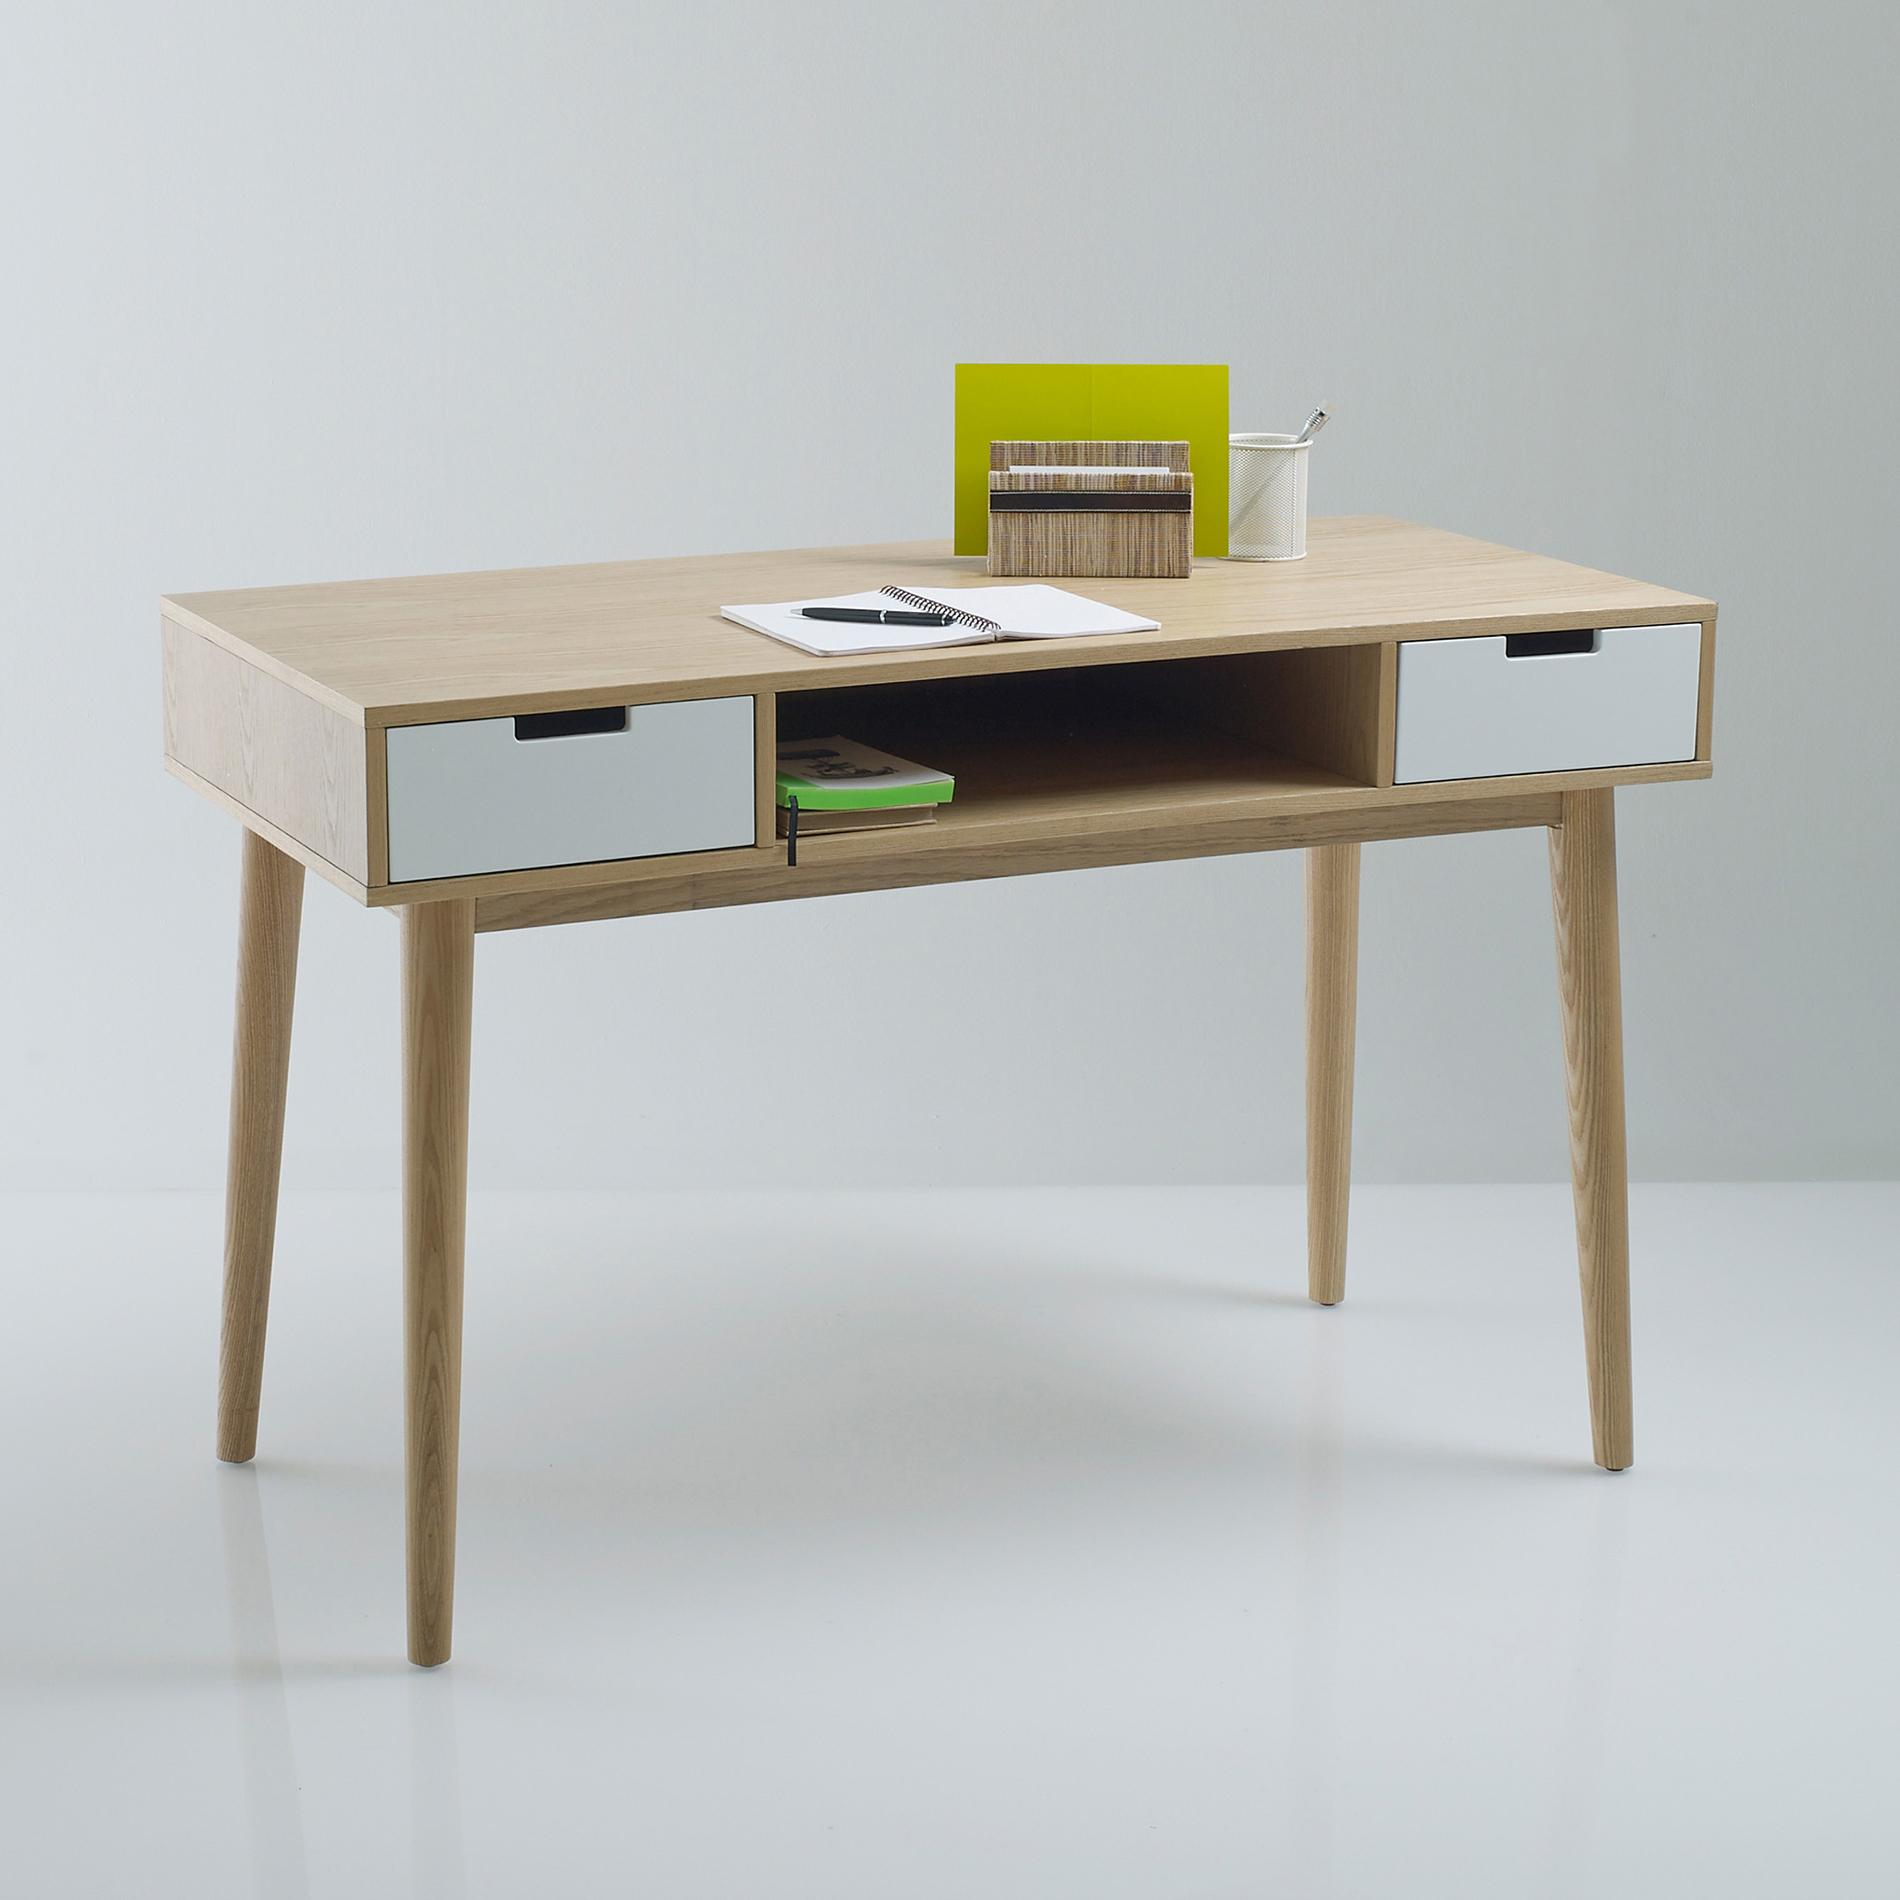 simple bureau ordinateur ikea home office faons damnager un joli coin bureau chez with coin. Black Bedroom Furniture Sets. Home Design Ideas